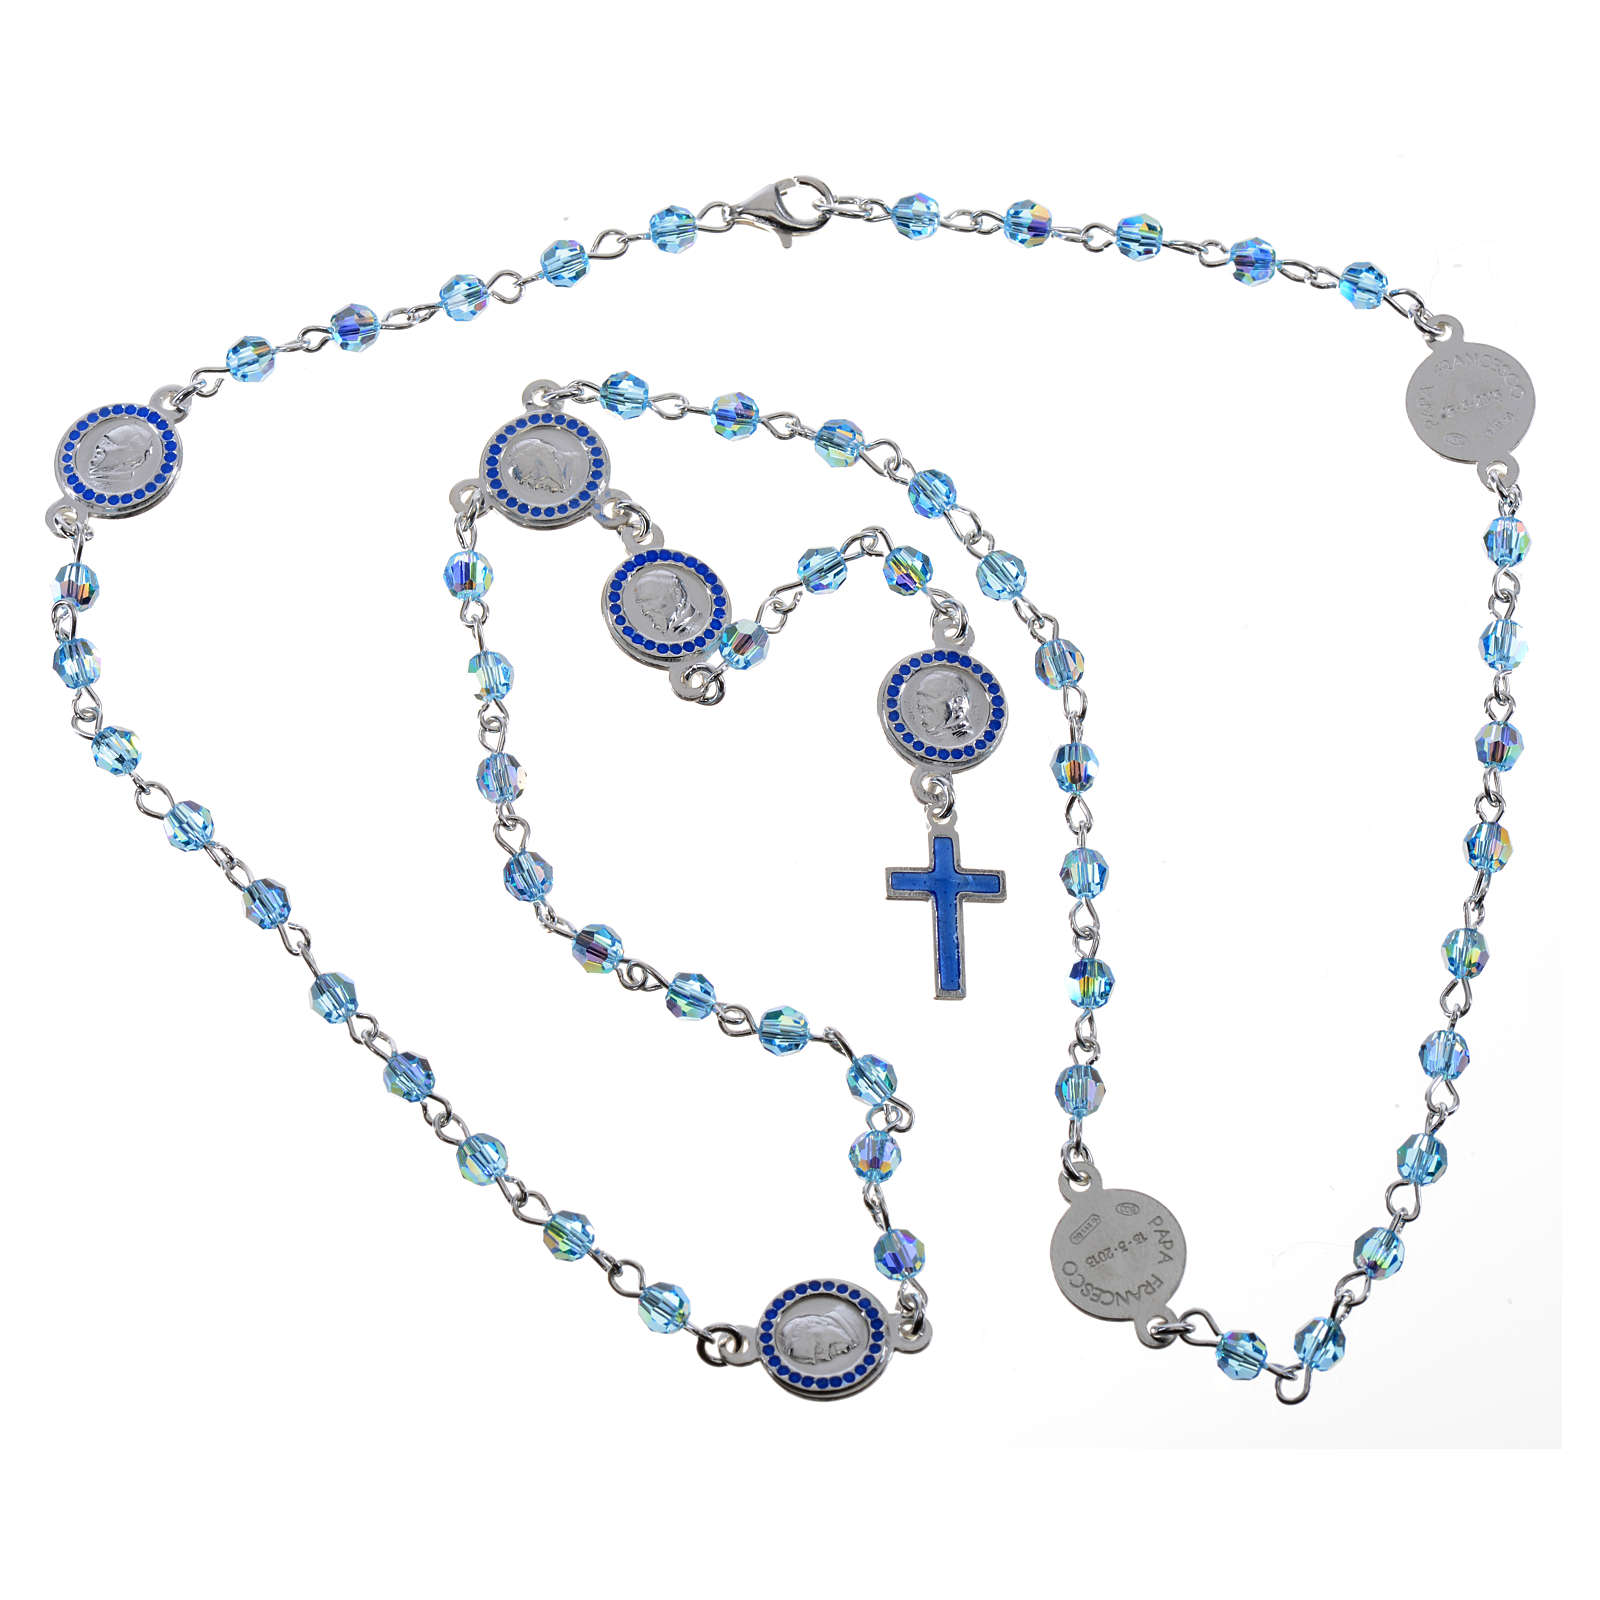 Chapelet Pape François Swarovski bleus argent 800 4